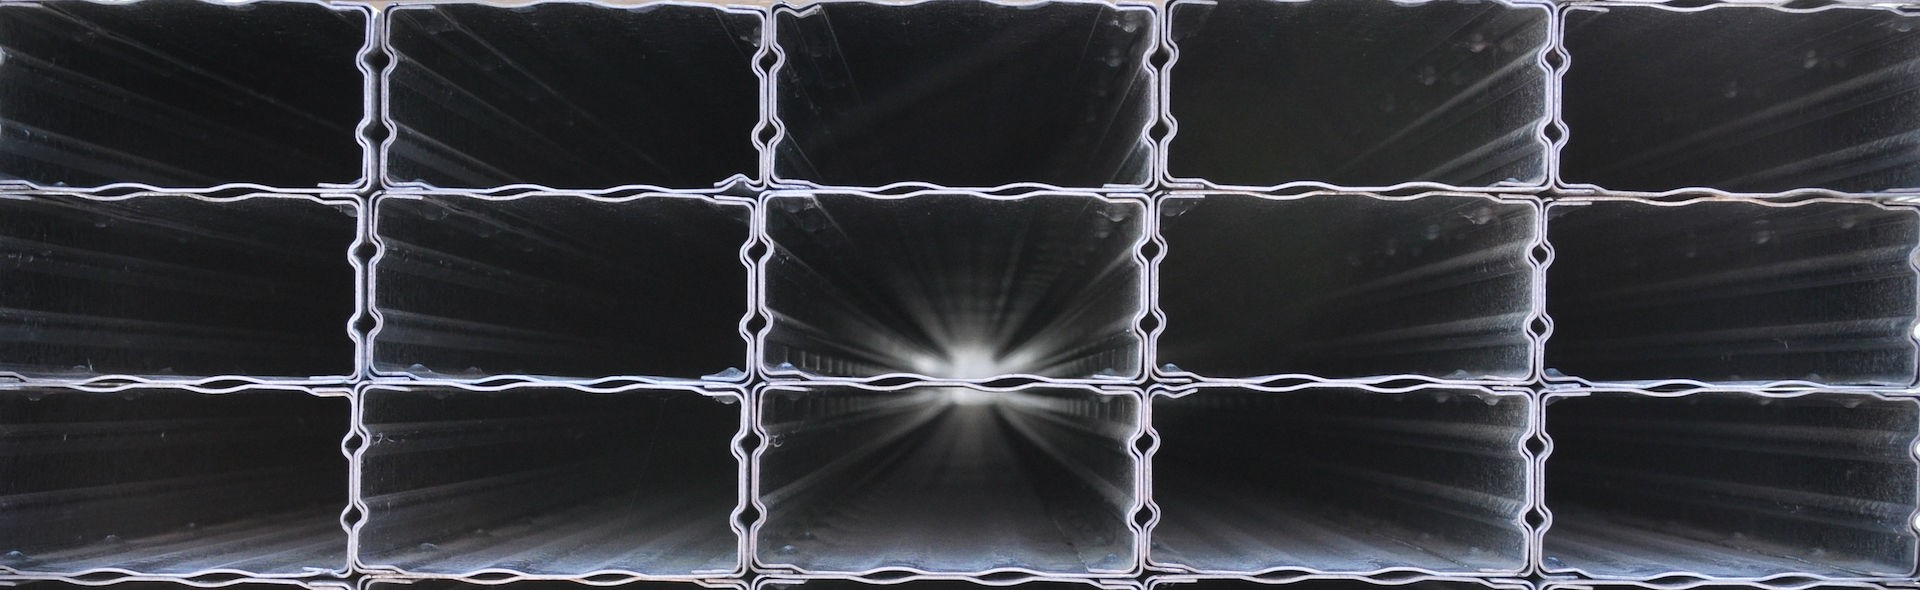 End view of a stack of Boxspan steeljoist beams B100-12 B150-12 B150-16 B200-16 B200-20 B250-20